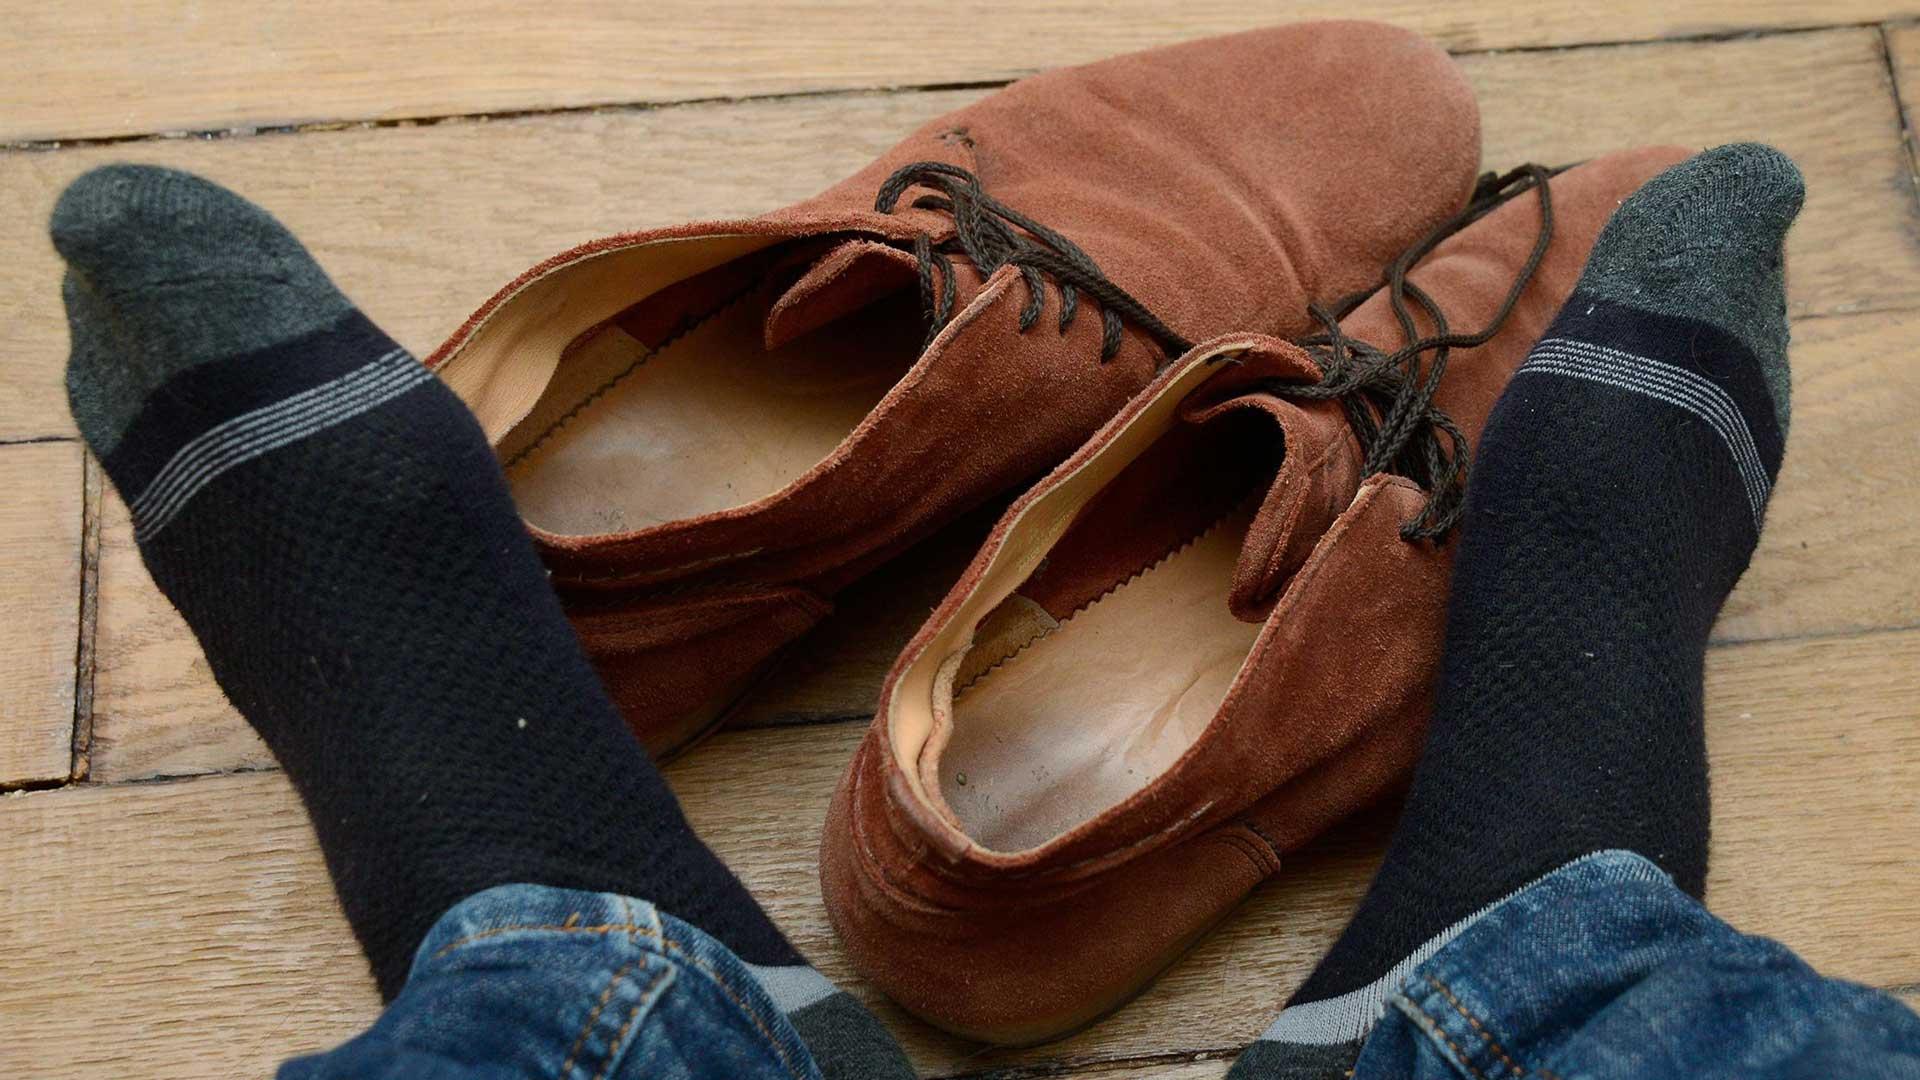 Cyprus Association of Registered Podiatrists - Blog, Sweaty Feet